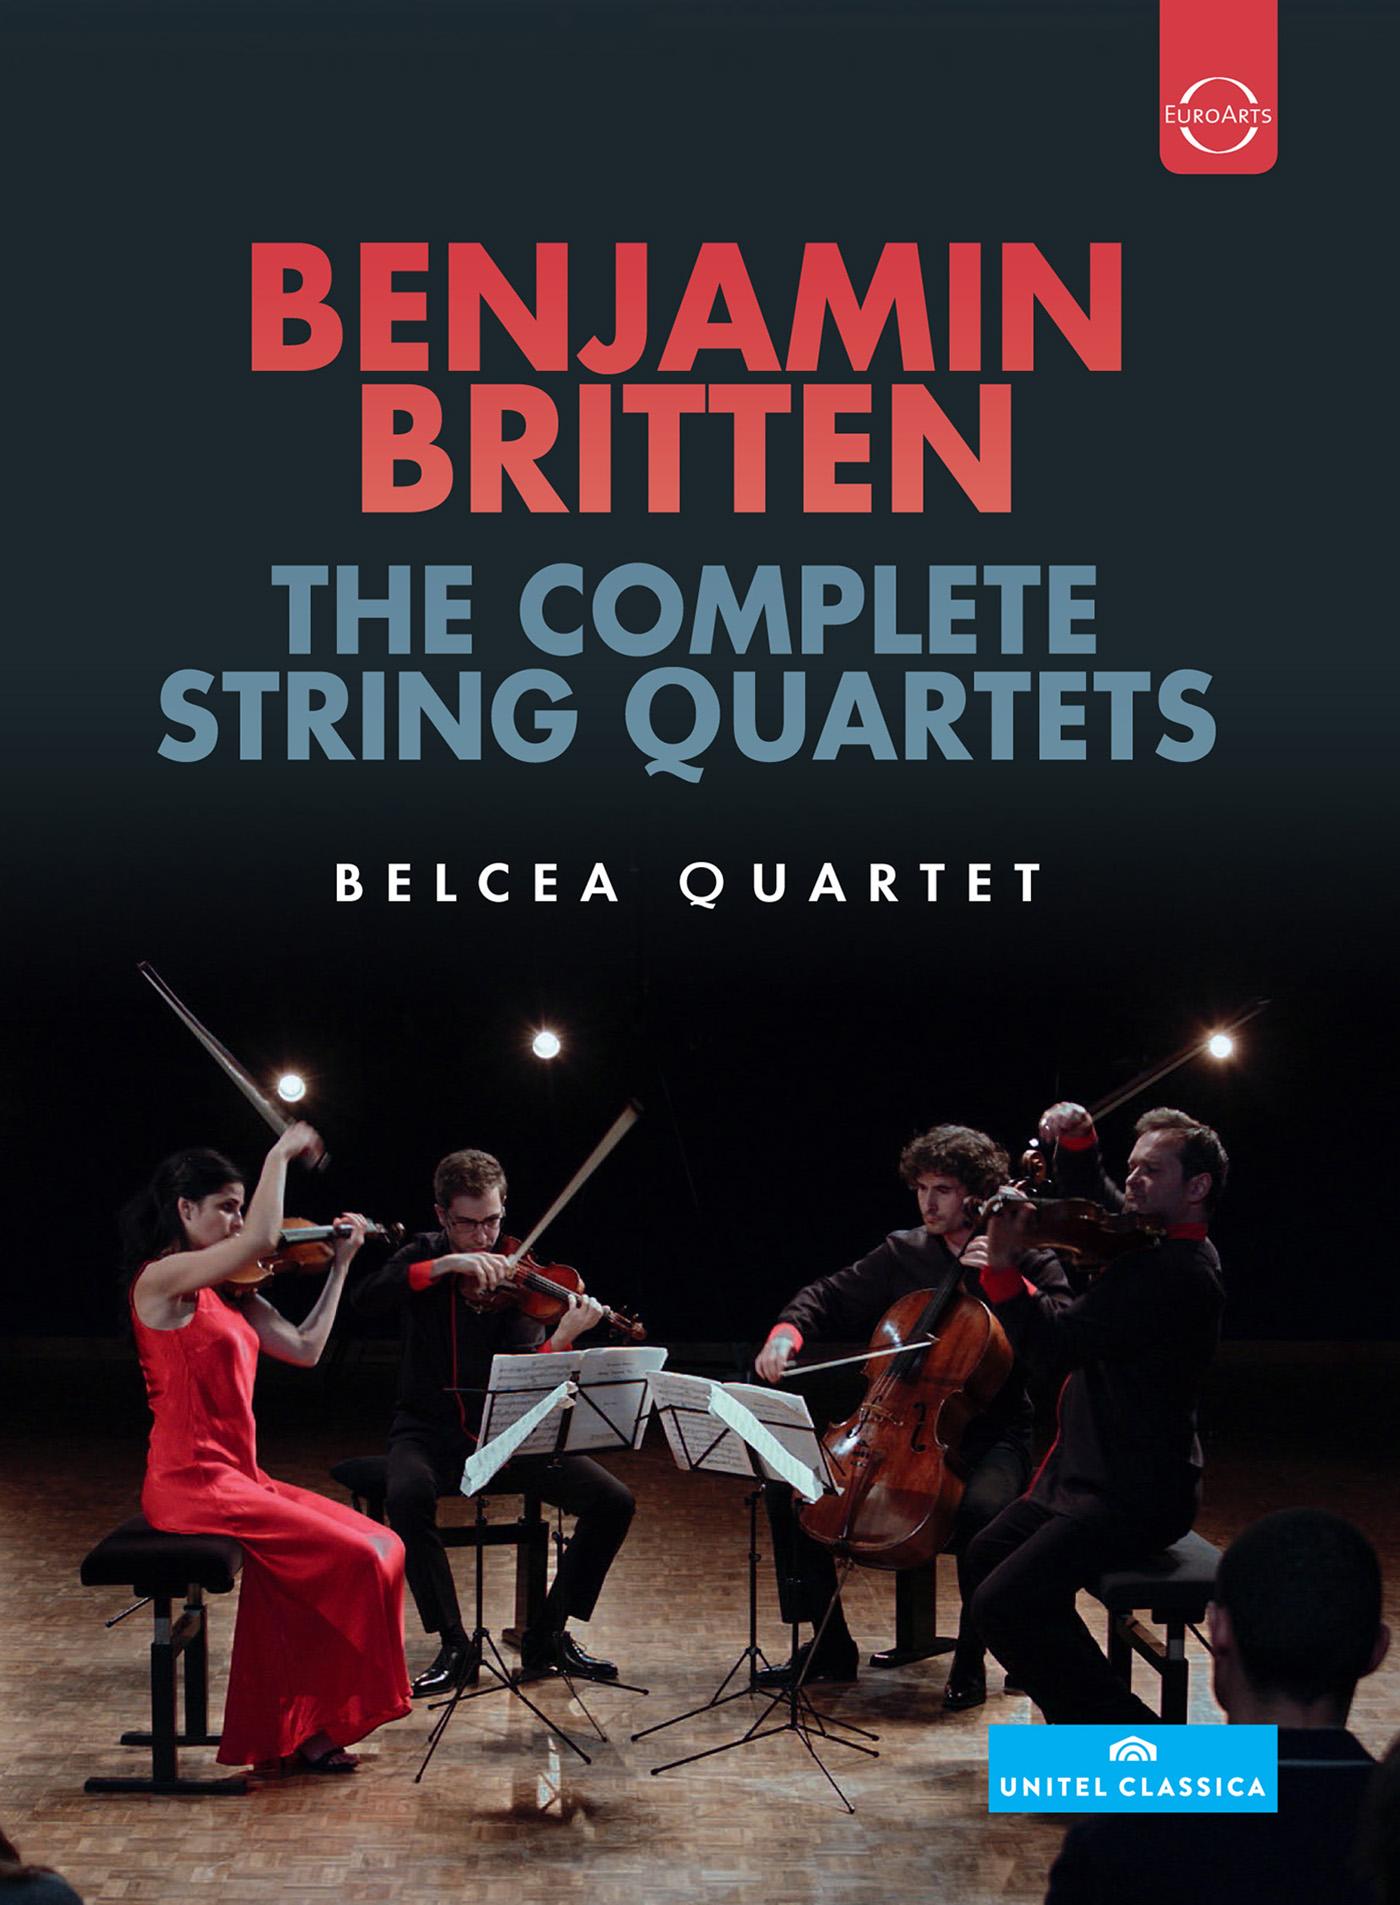 Beleca Quartet: Benjamin Britten - The String Quartets